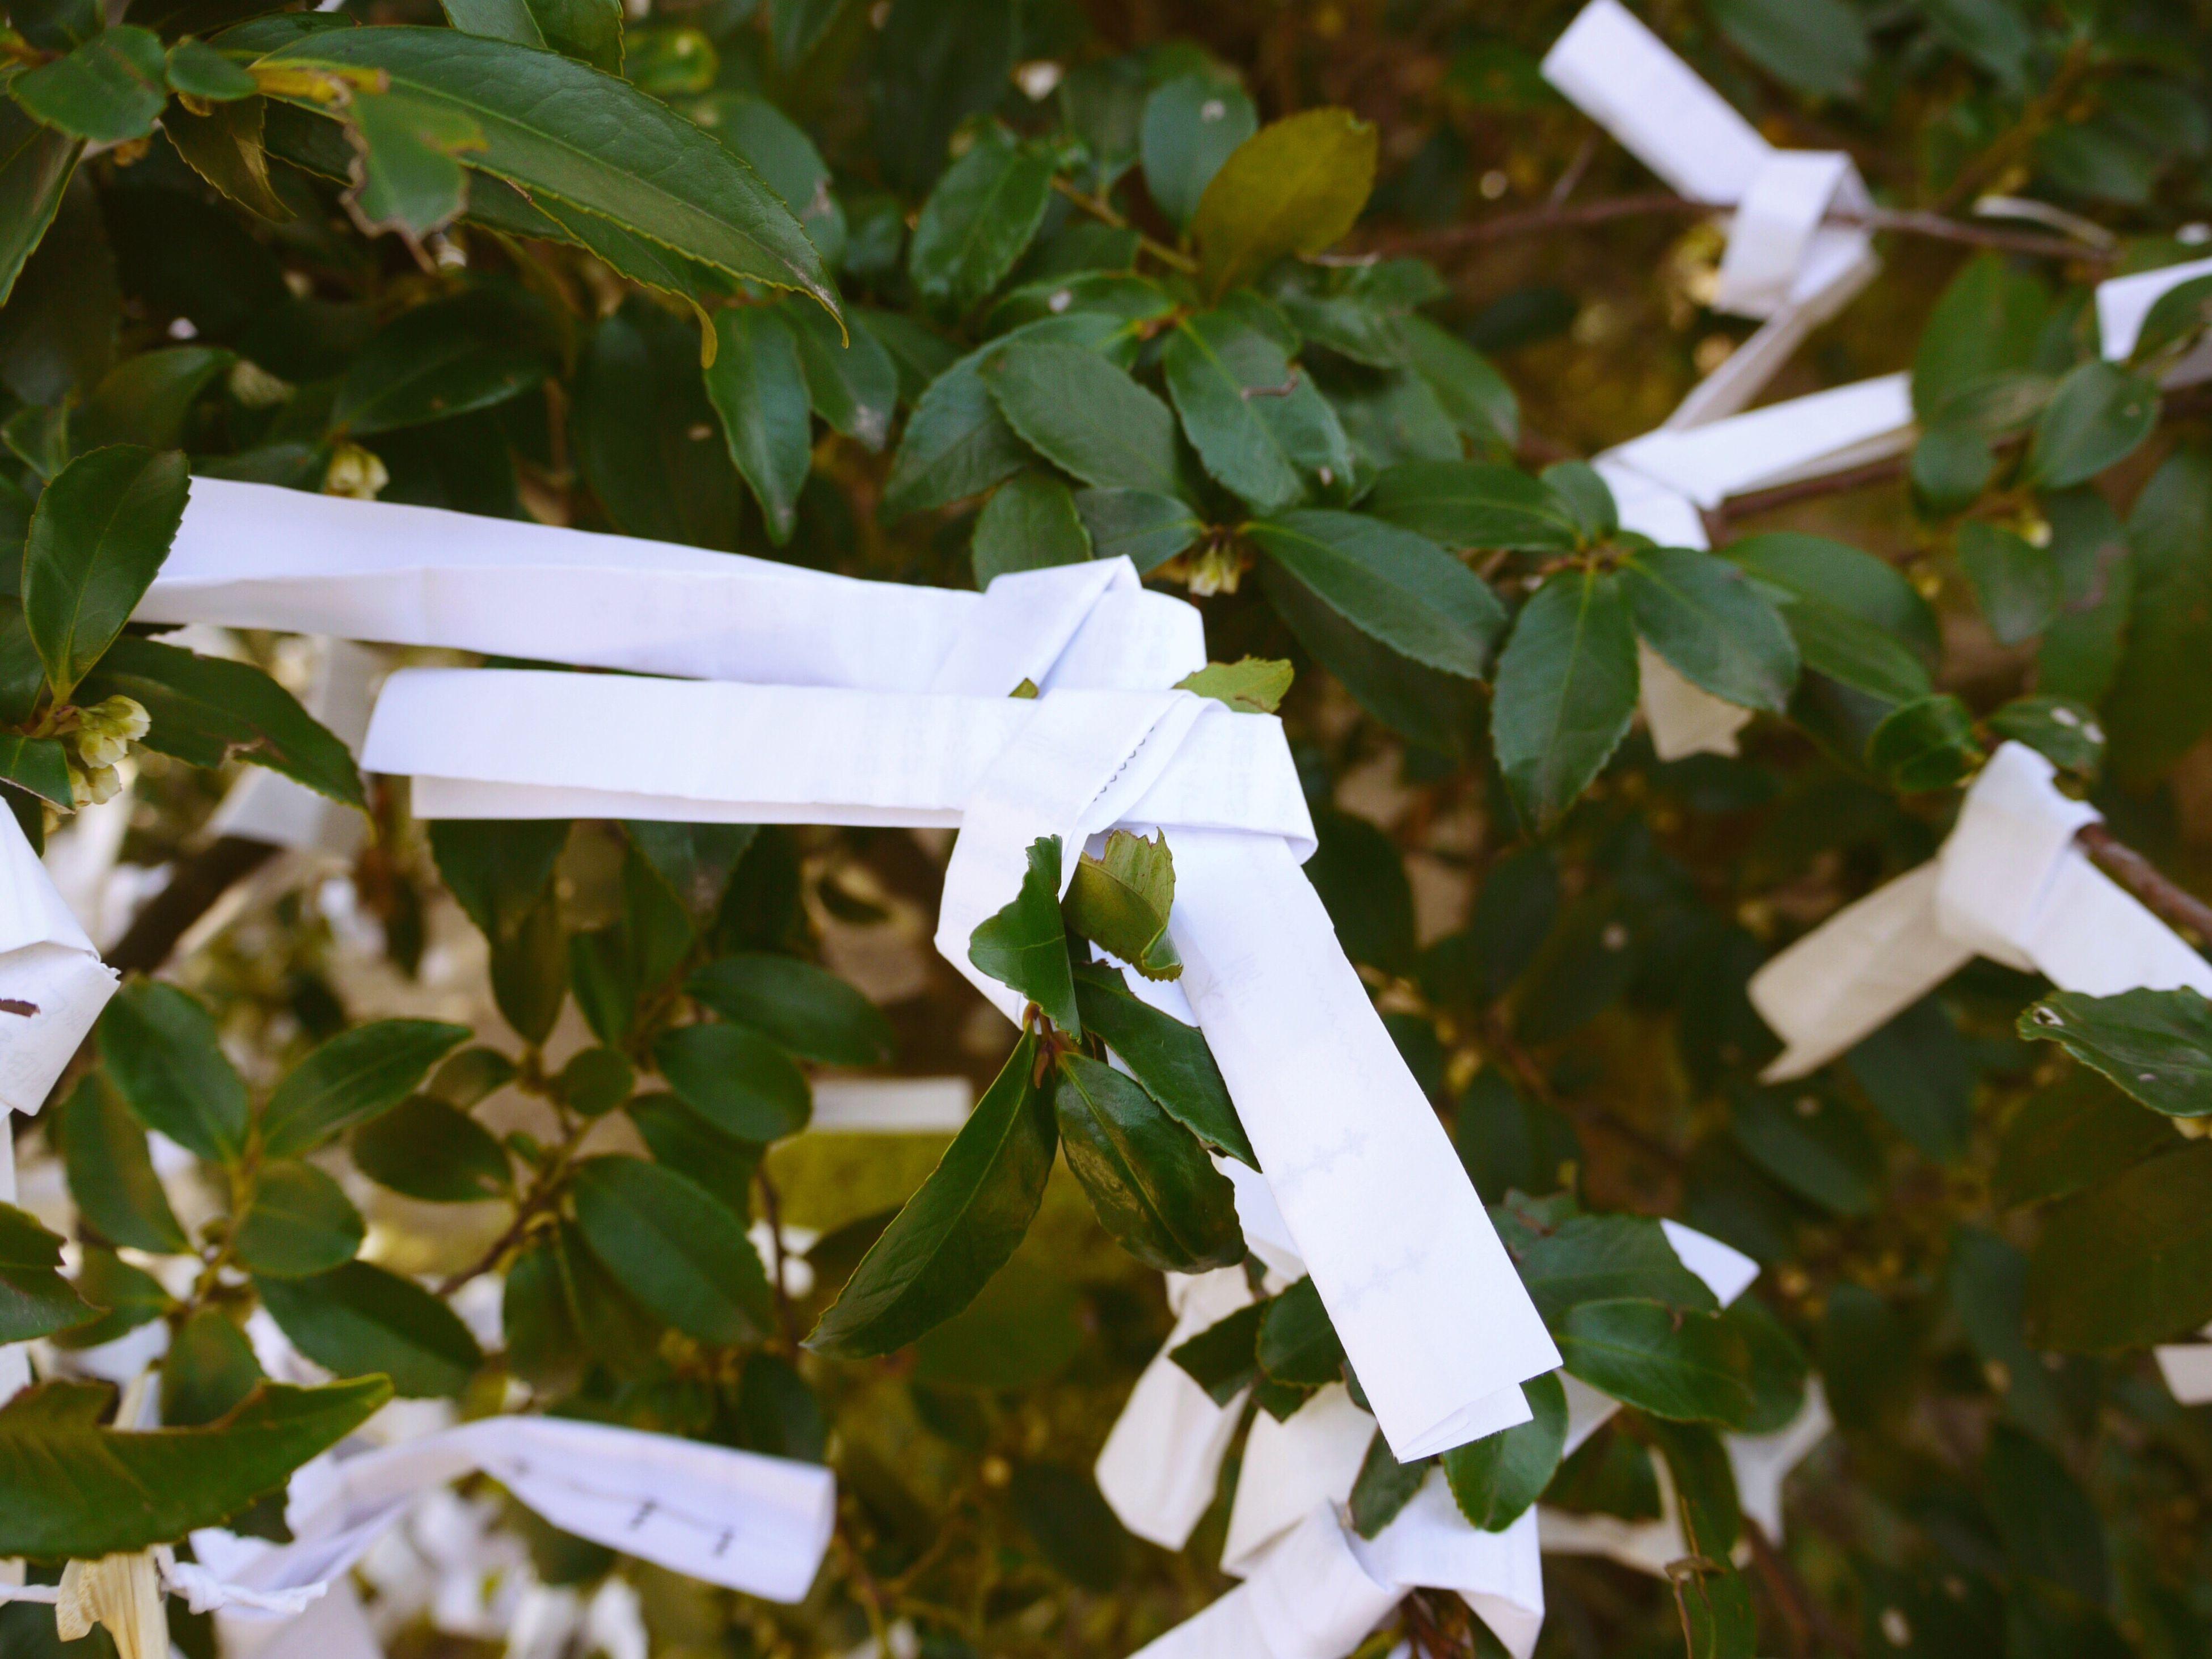 Paper Fortune Omikuji Great Blessing Dai-kichi, 大吉 Small Blessing Shō-kichi, 小吉 💕